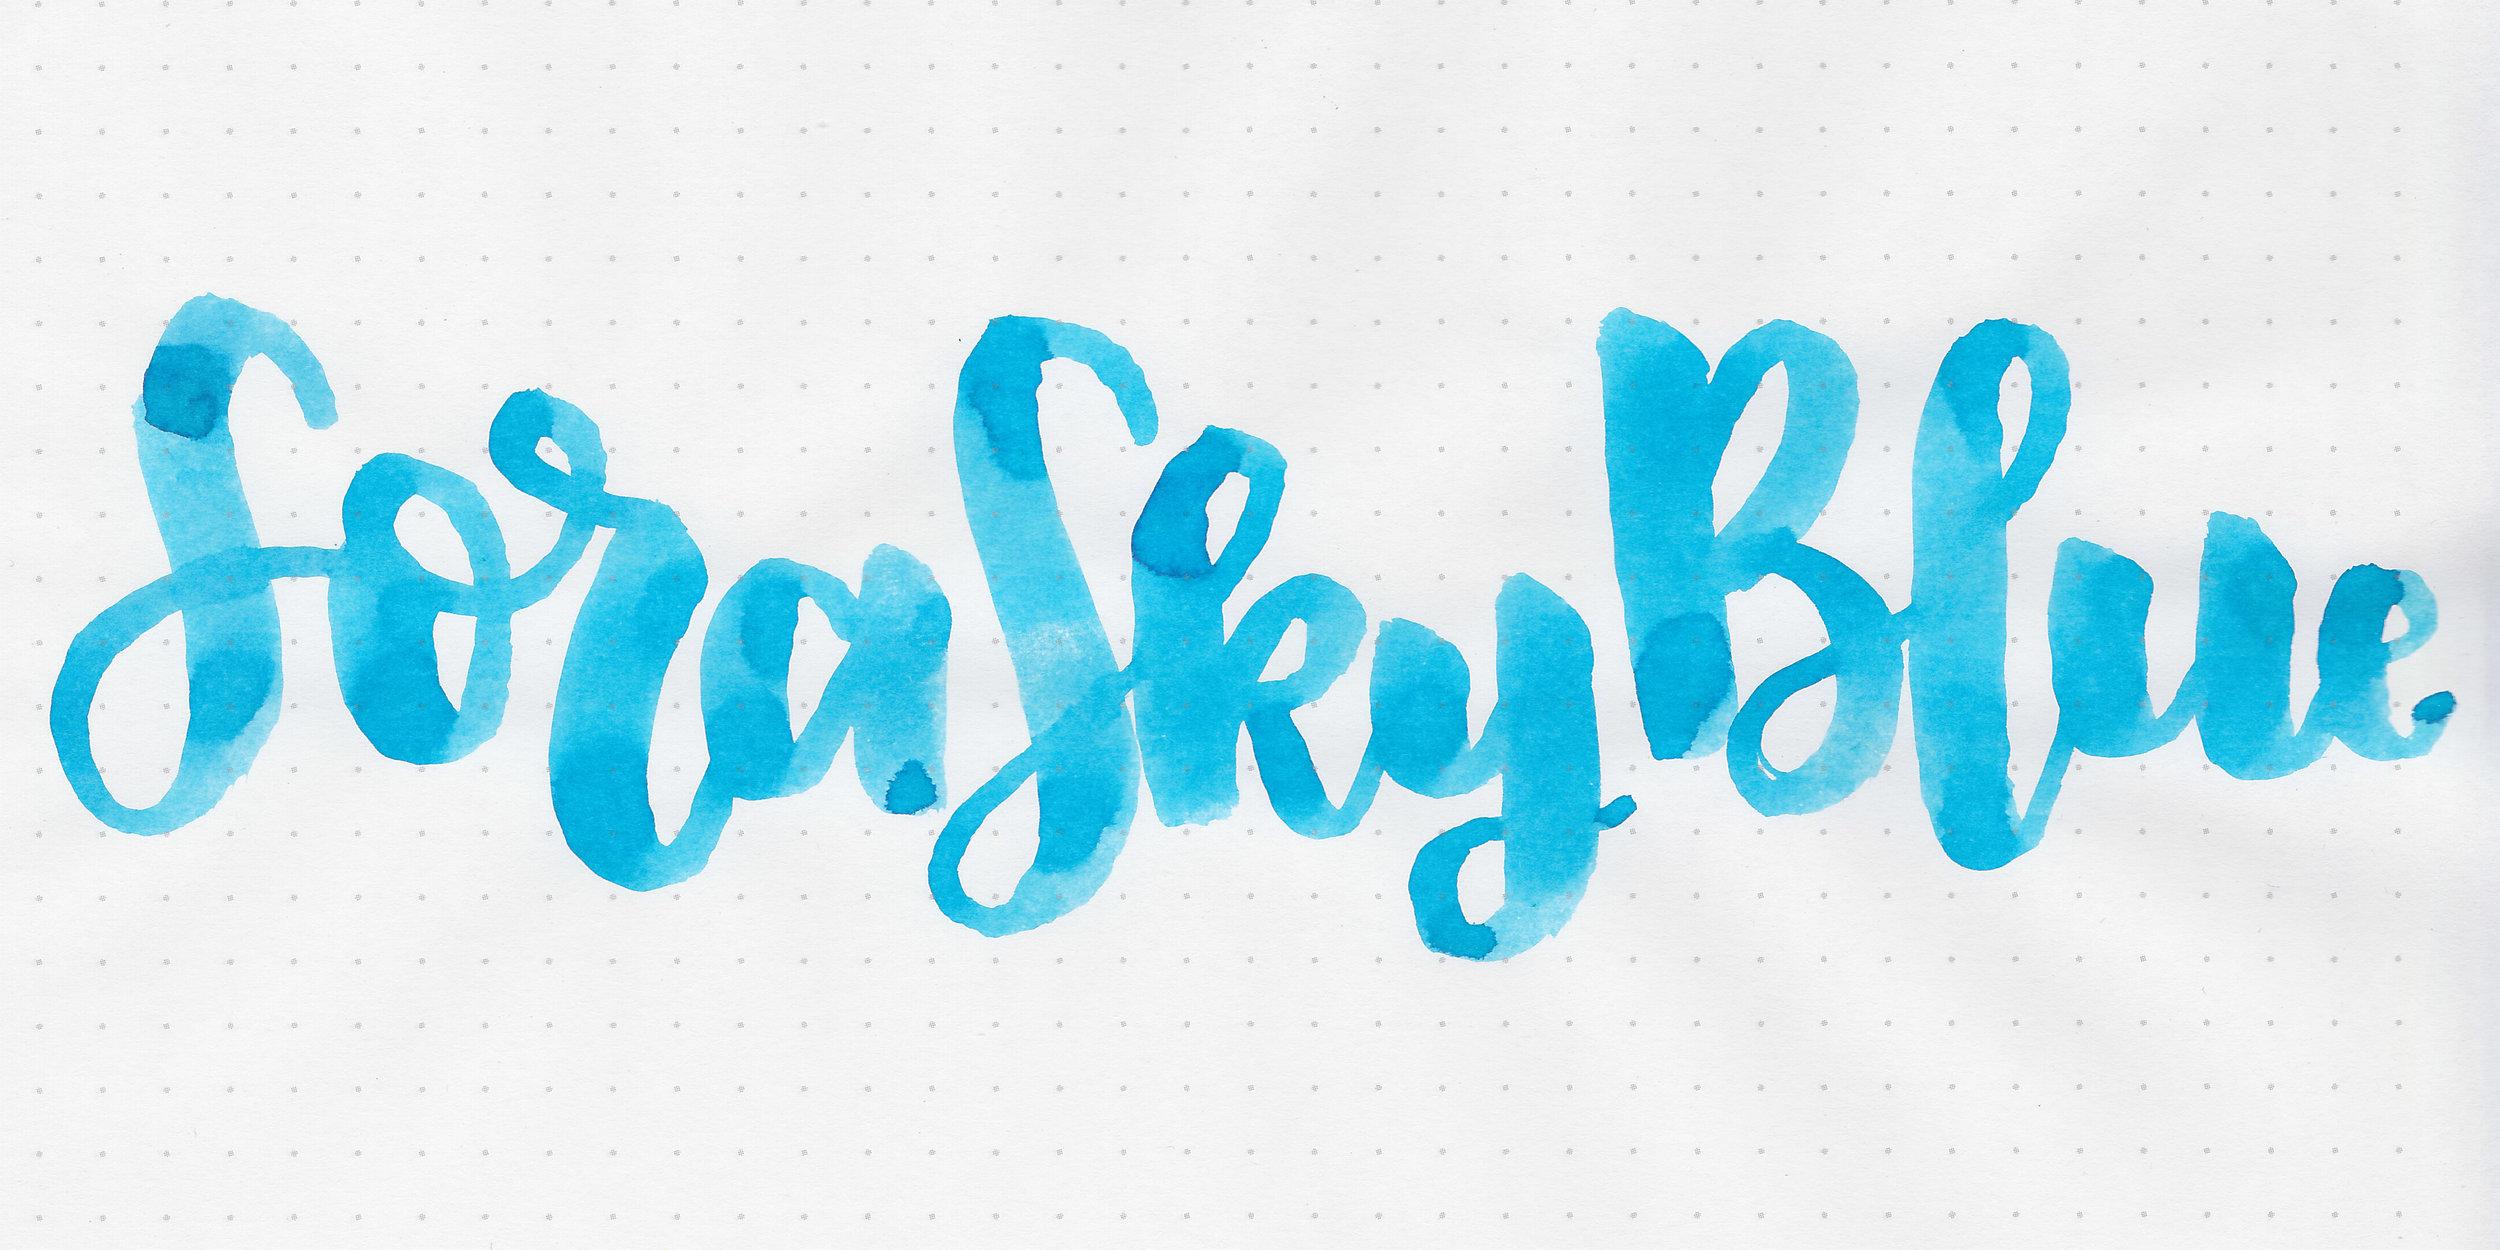 tac-sora-sky-blue-4.jpg